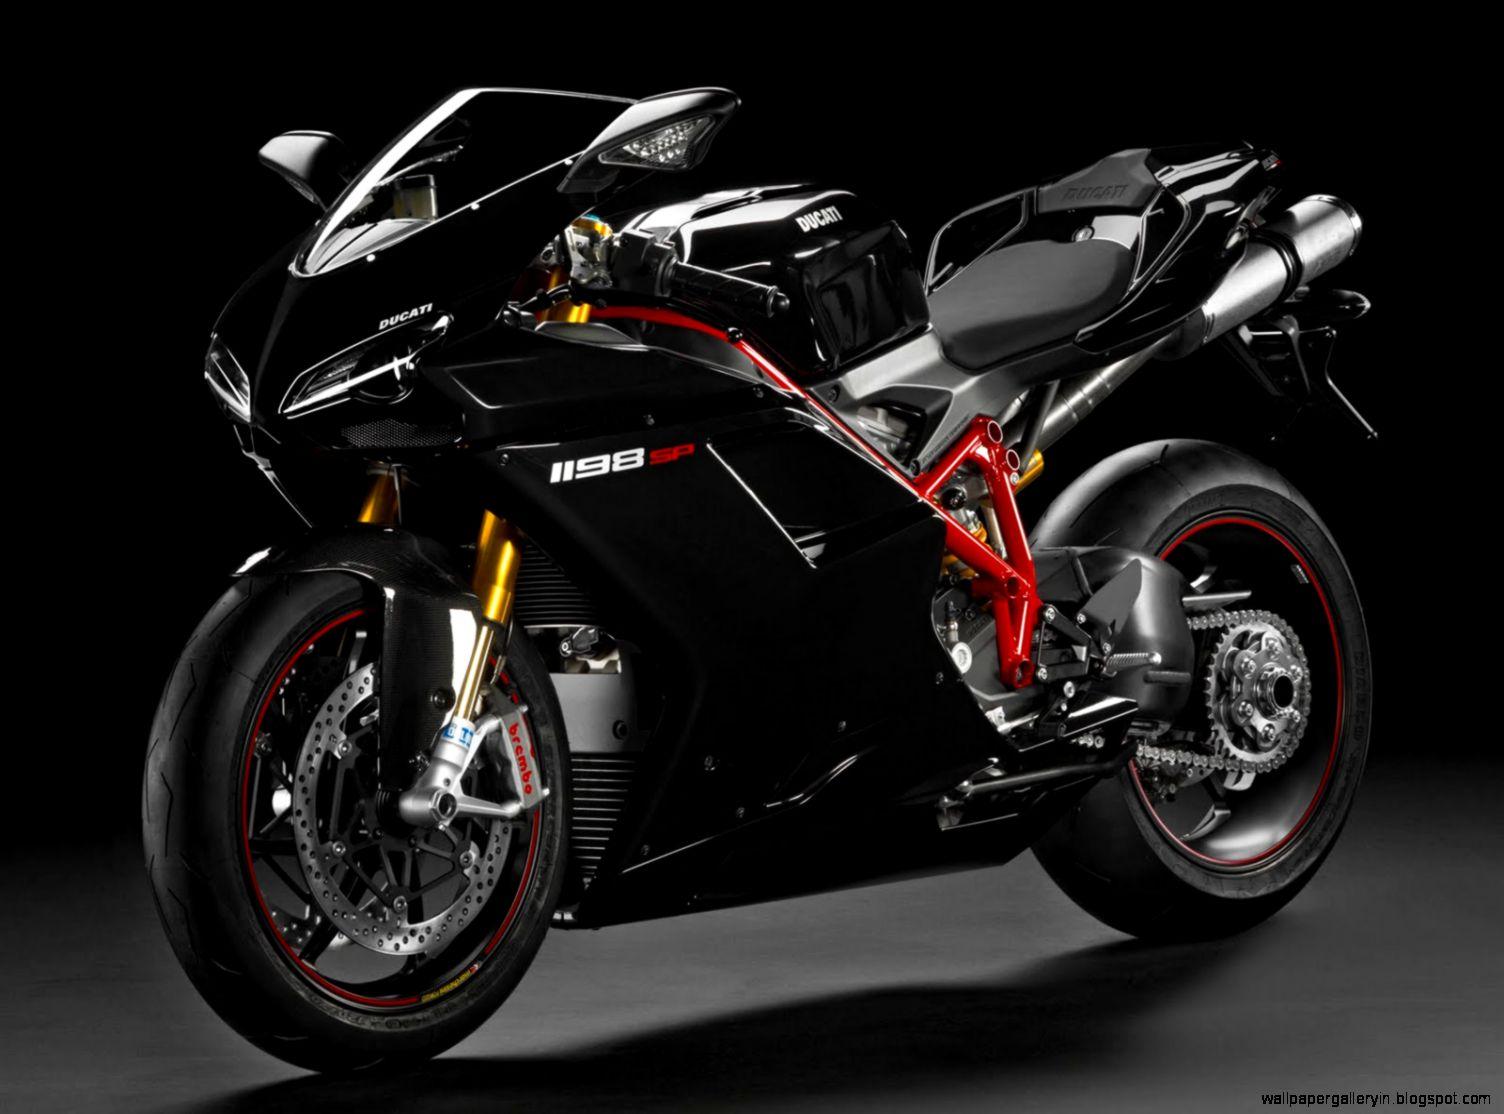 Ducati Superbike Black Color In Room Wallpaper Desktop  Free High